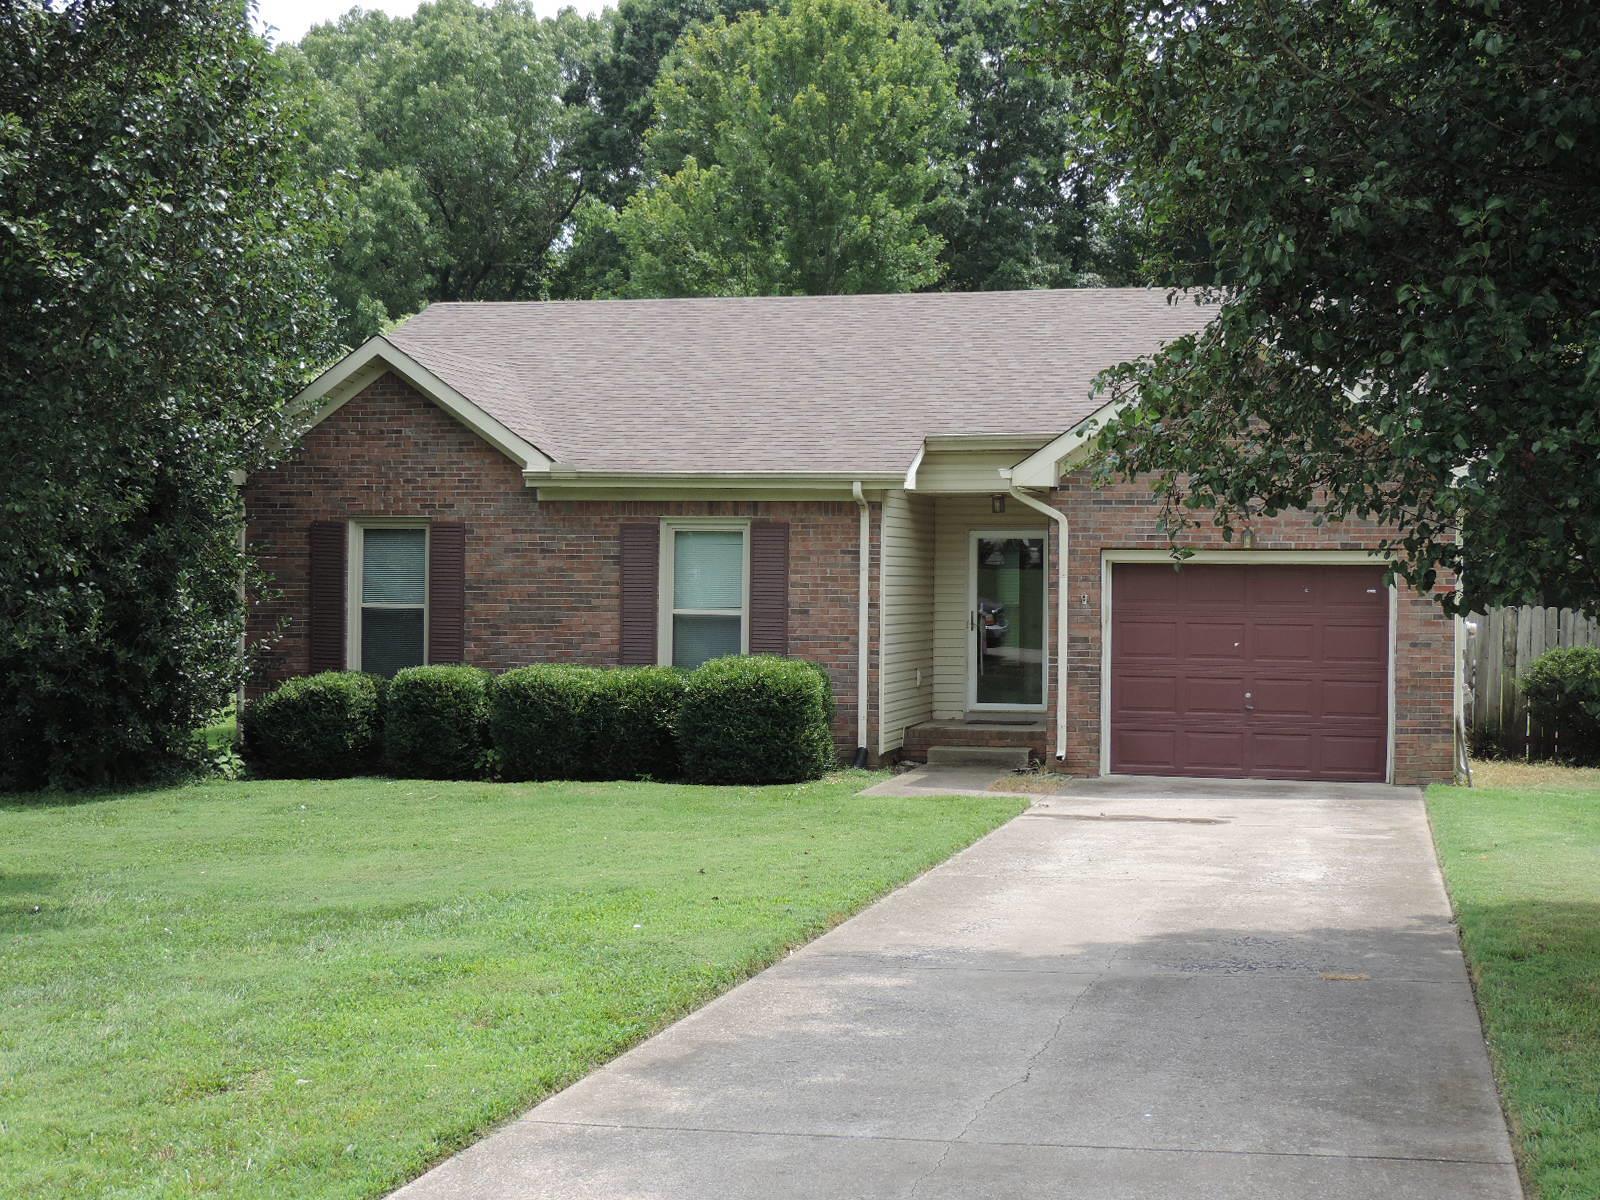 3442 Laurelwood Trl, Clarksville, TN 37043